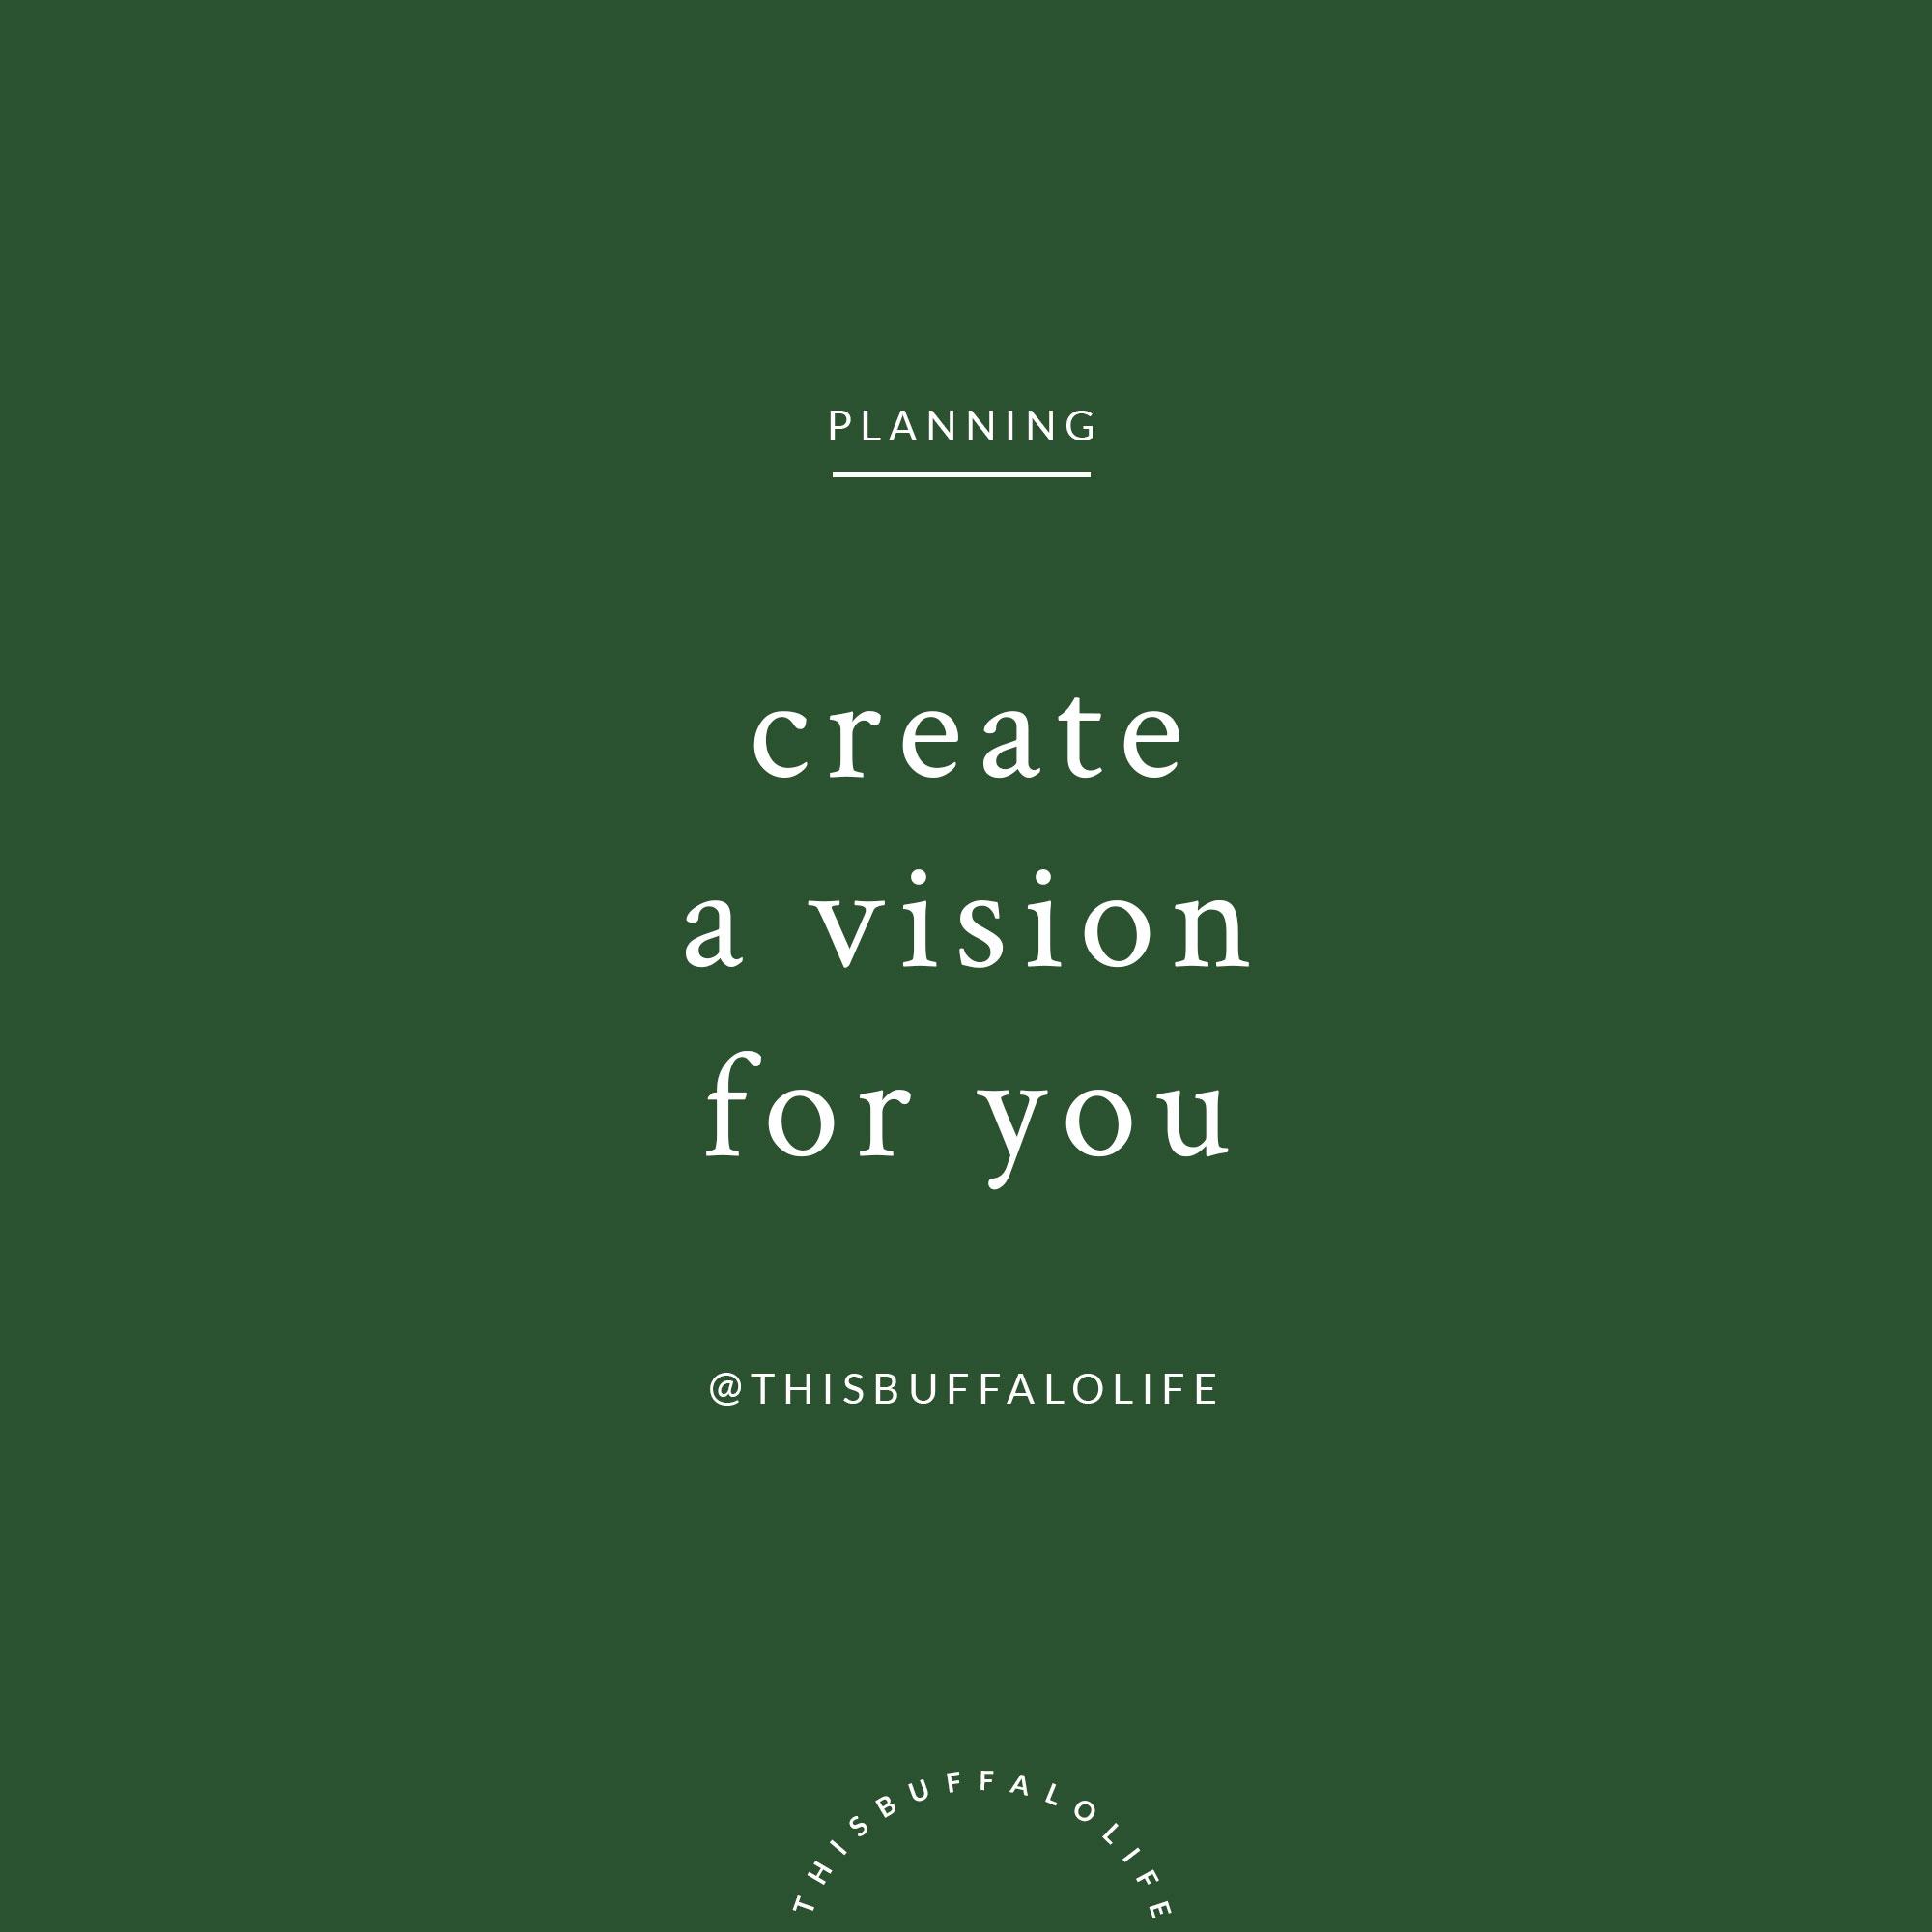 createvision.jpg